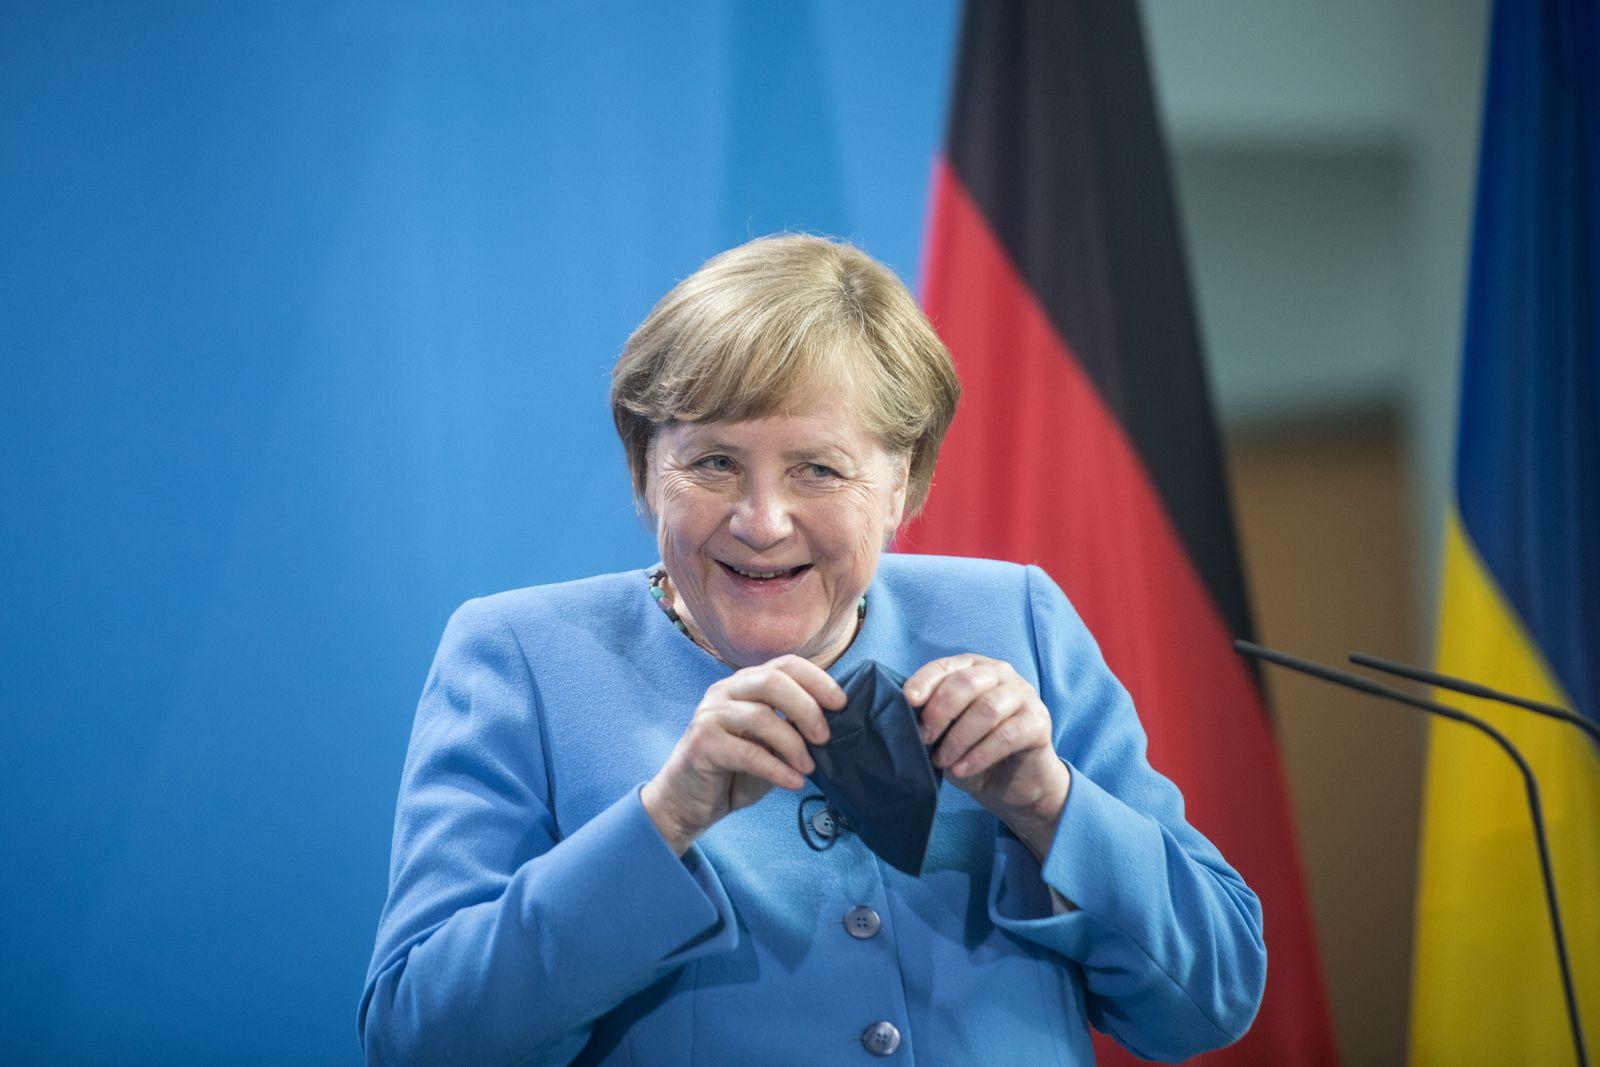 German Chancellor Angela Merkel meets Ukrainian President Volodymyr Zelensky